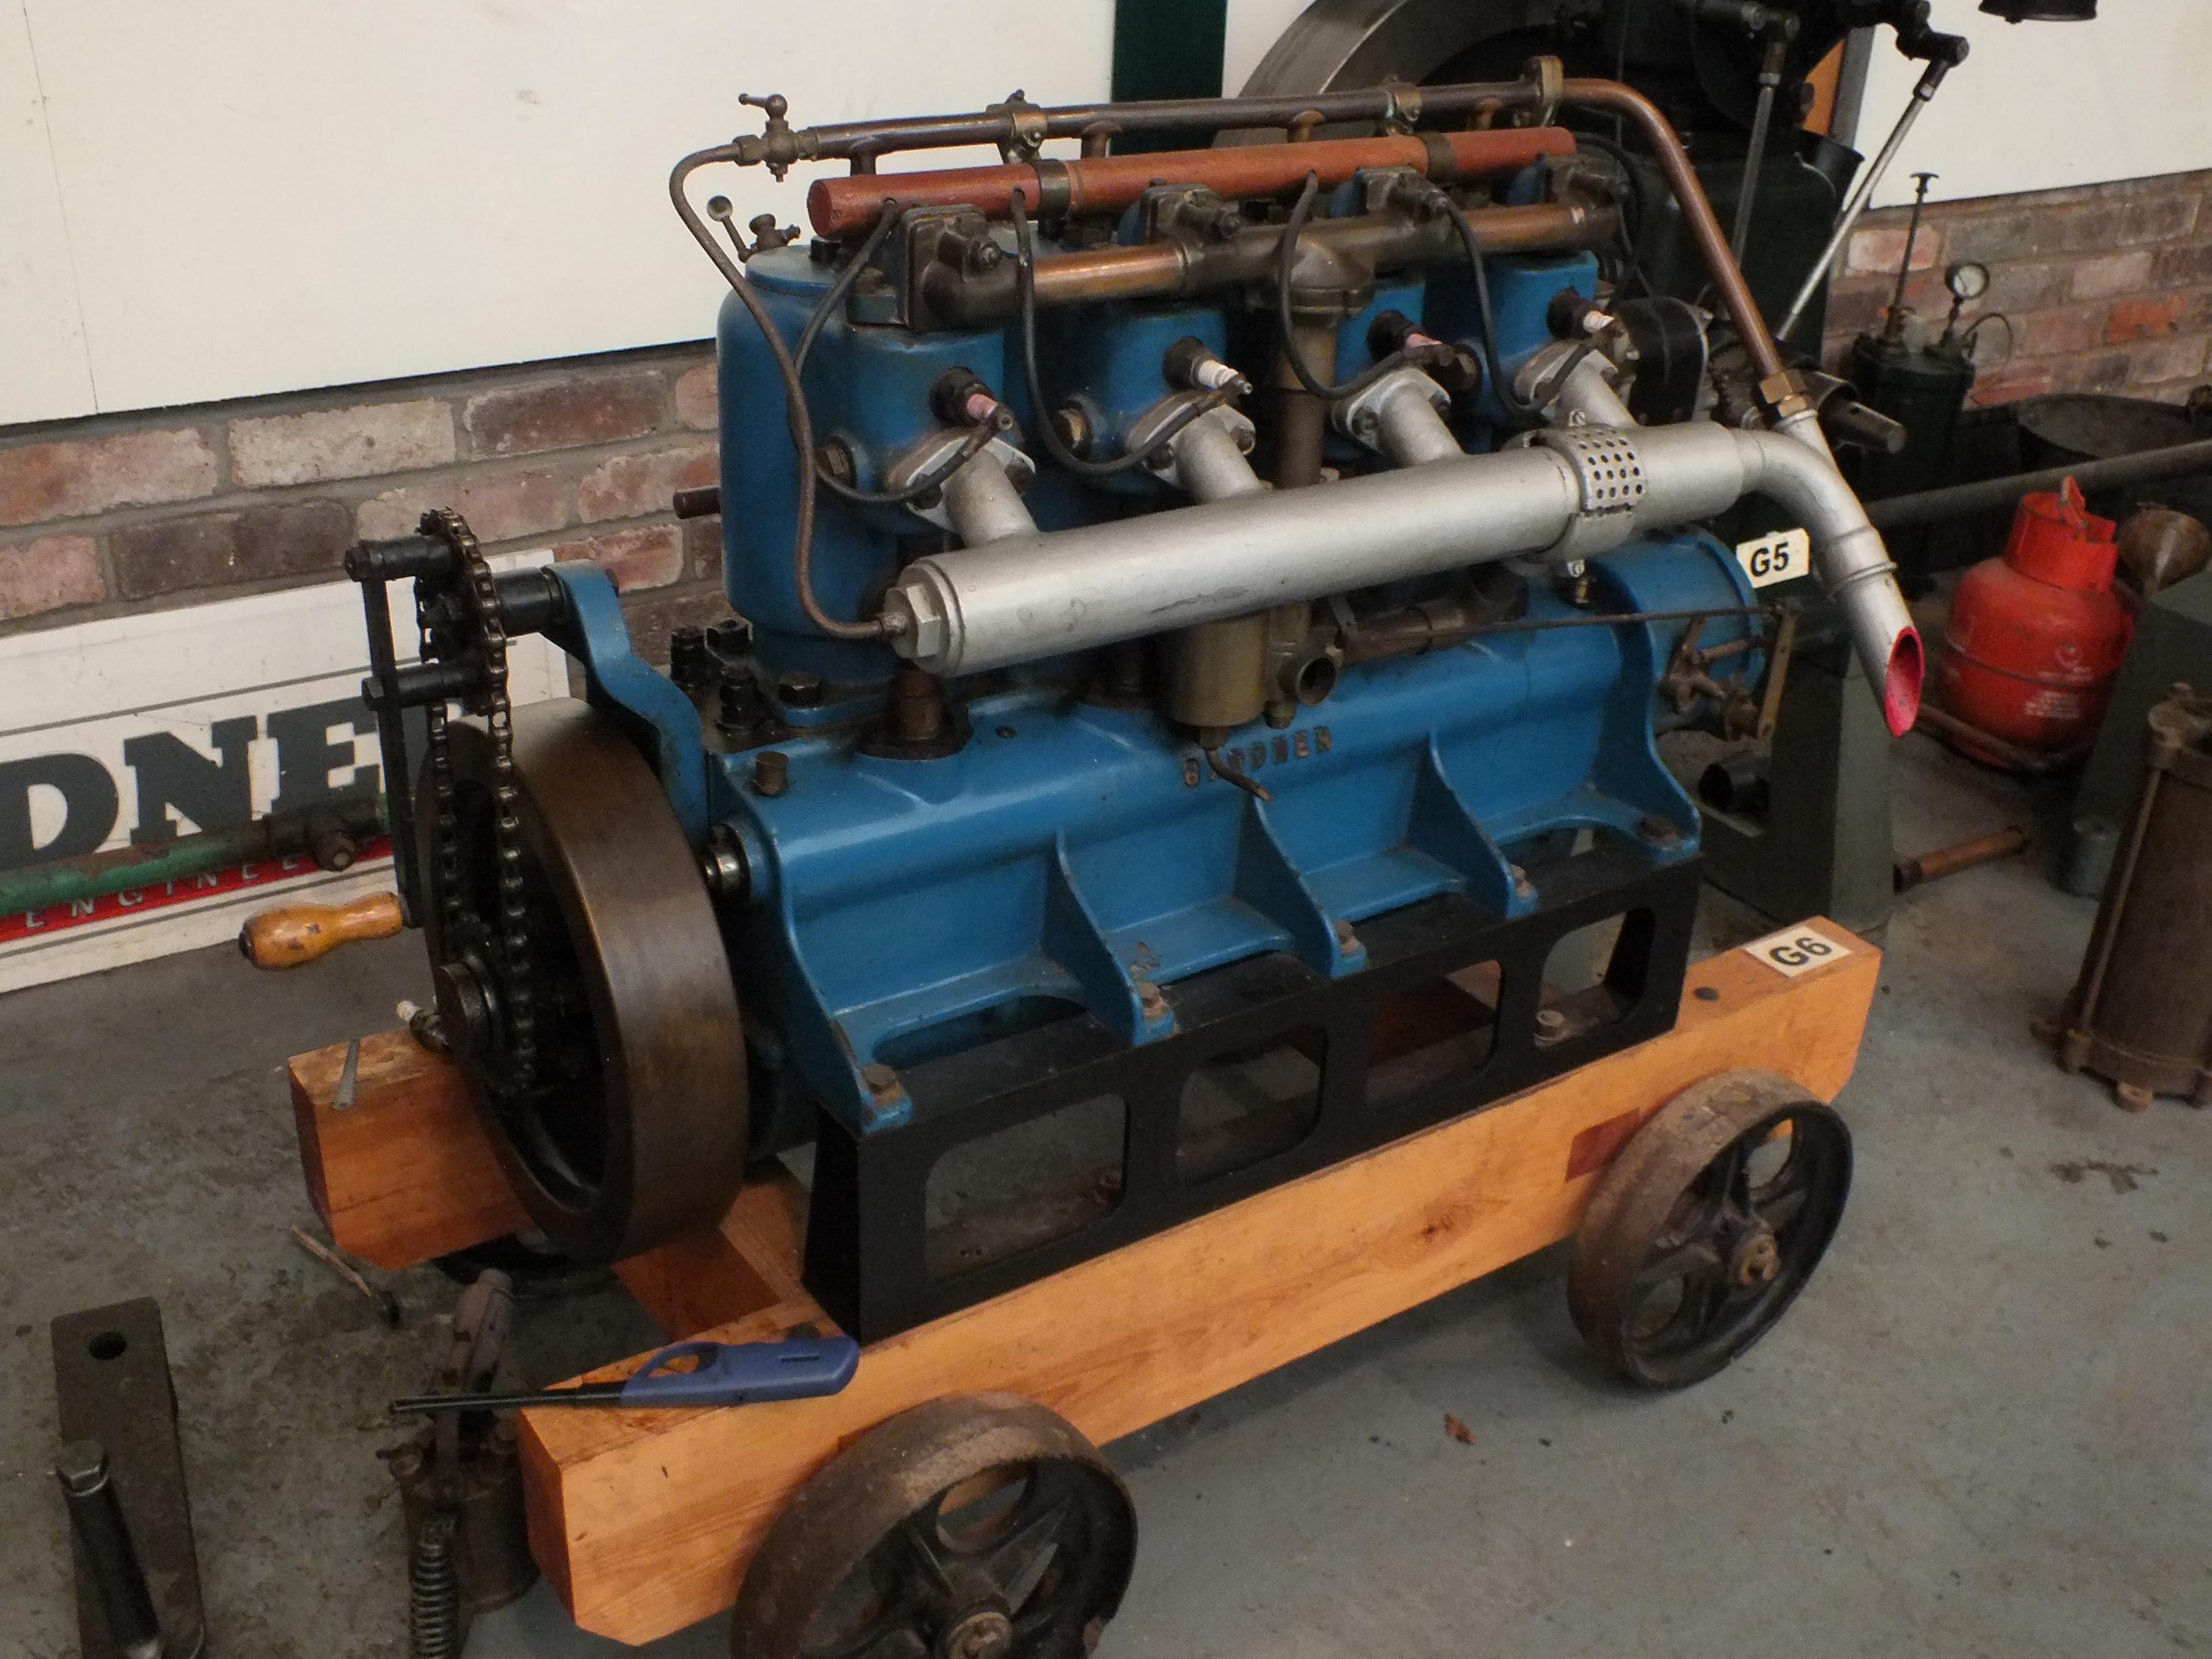 File:Gardner 1908 Type 4CR Marine Petrol Engine Anson 6237.JPG